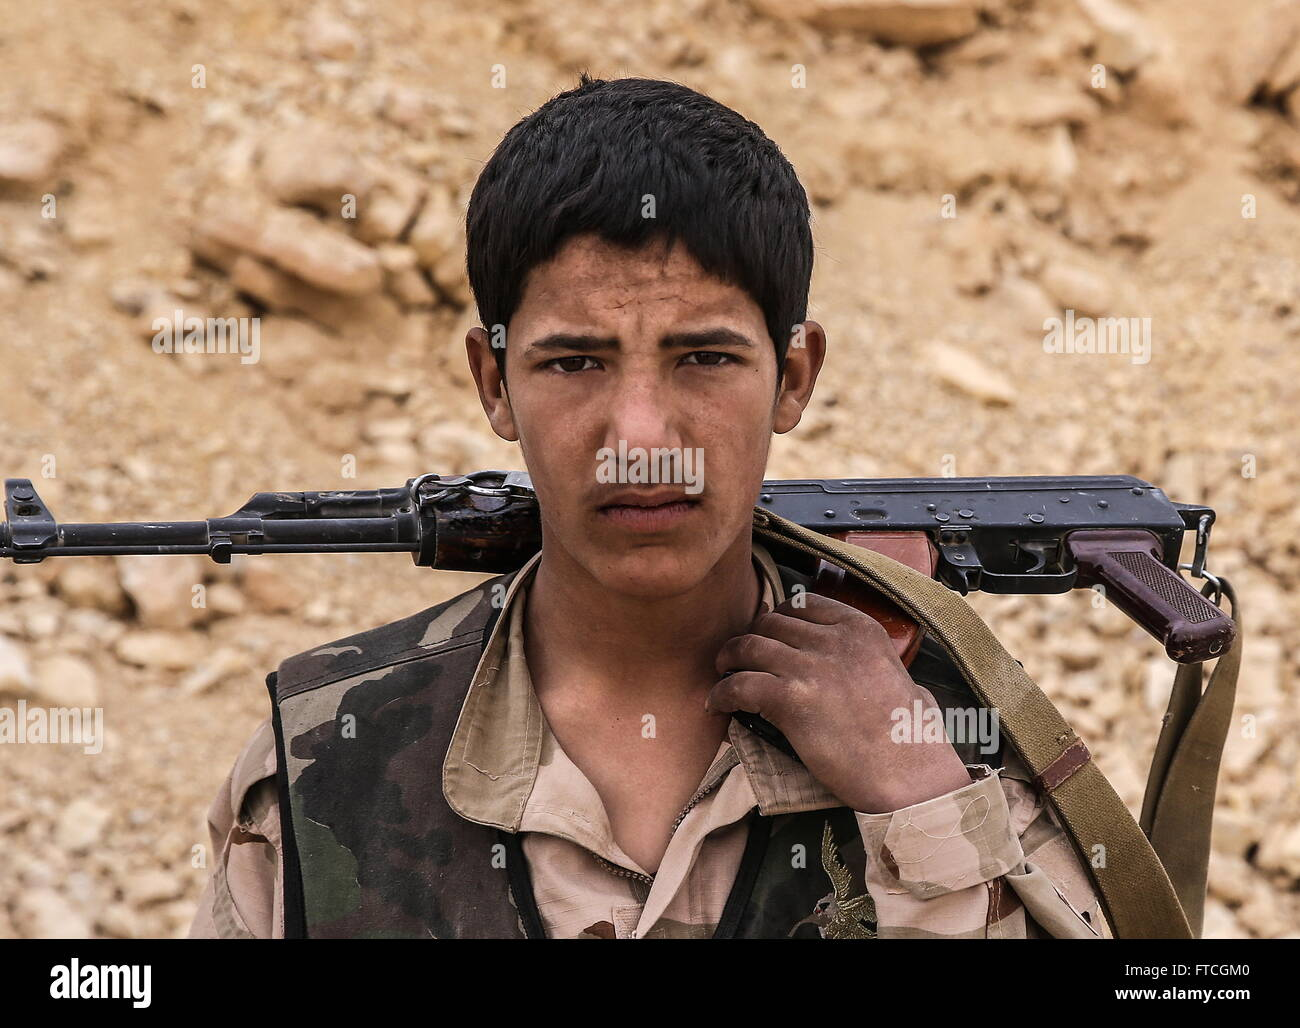 Palmyria, Syria. 26th Mar, 2016. Syrian government army soldier Akhmad (17) near Fakhr al-Din al-Maani Citadel in - Stock Image